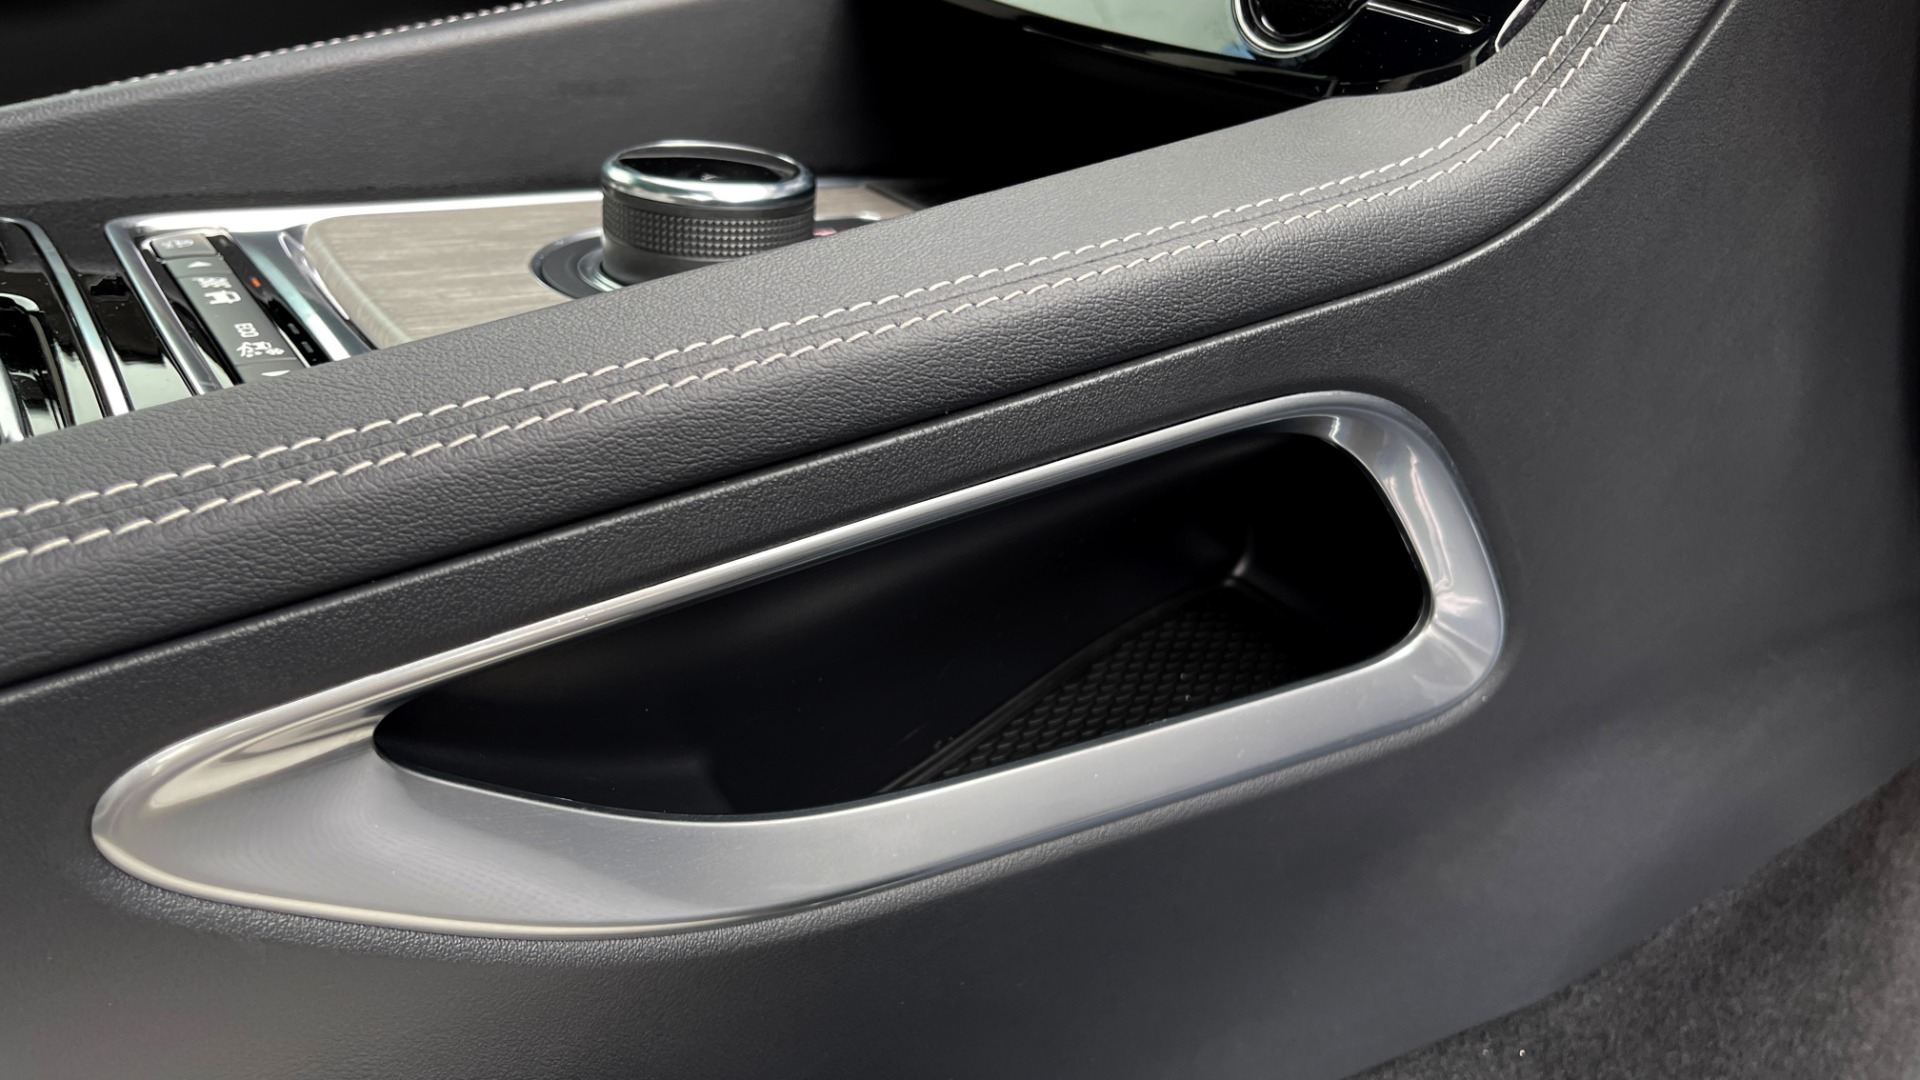 Used 2019 Jaguar F-PACE S / DRIVE PKG / BSA / HUD / BLACK EXT PKG / REARVIEW for sale $50,995 at Formula Imports in Charlotte NC 28227 66